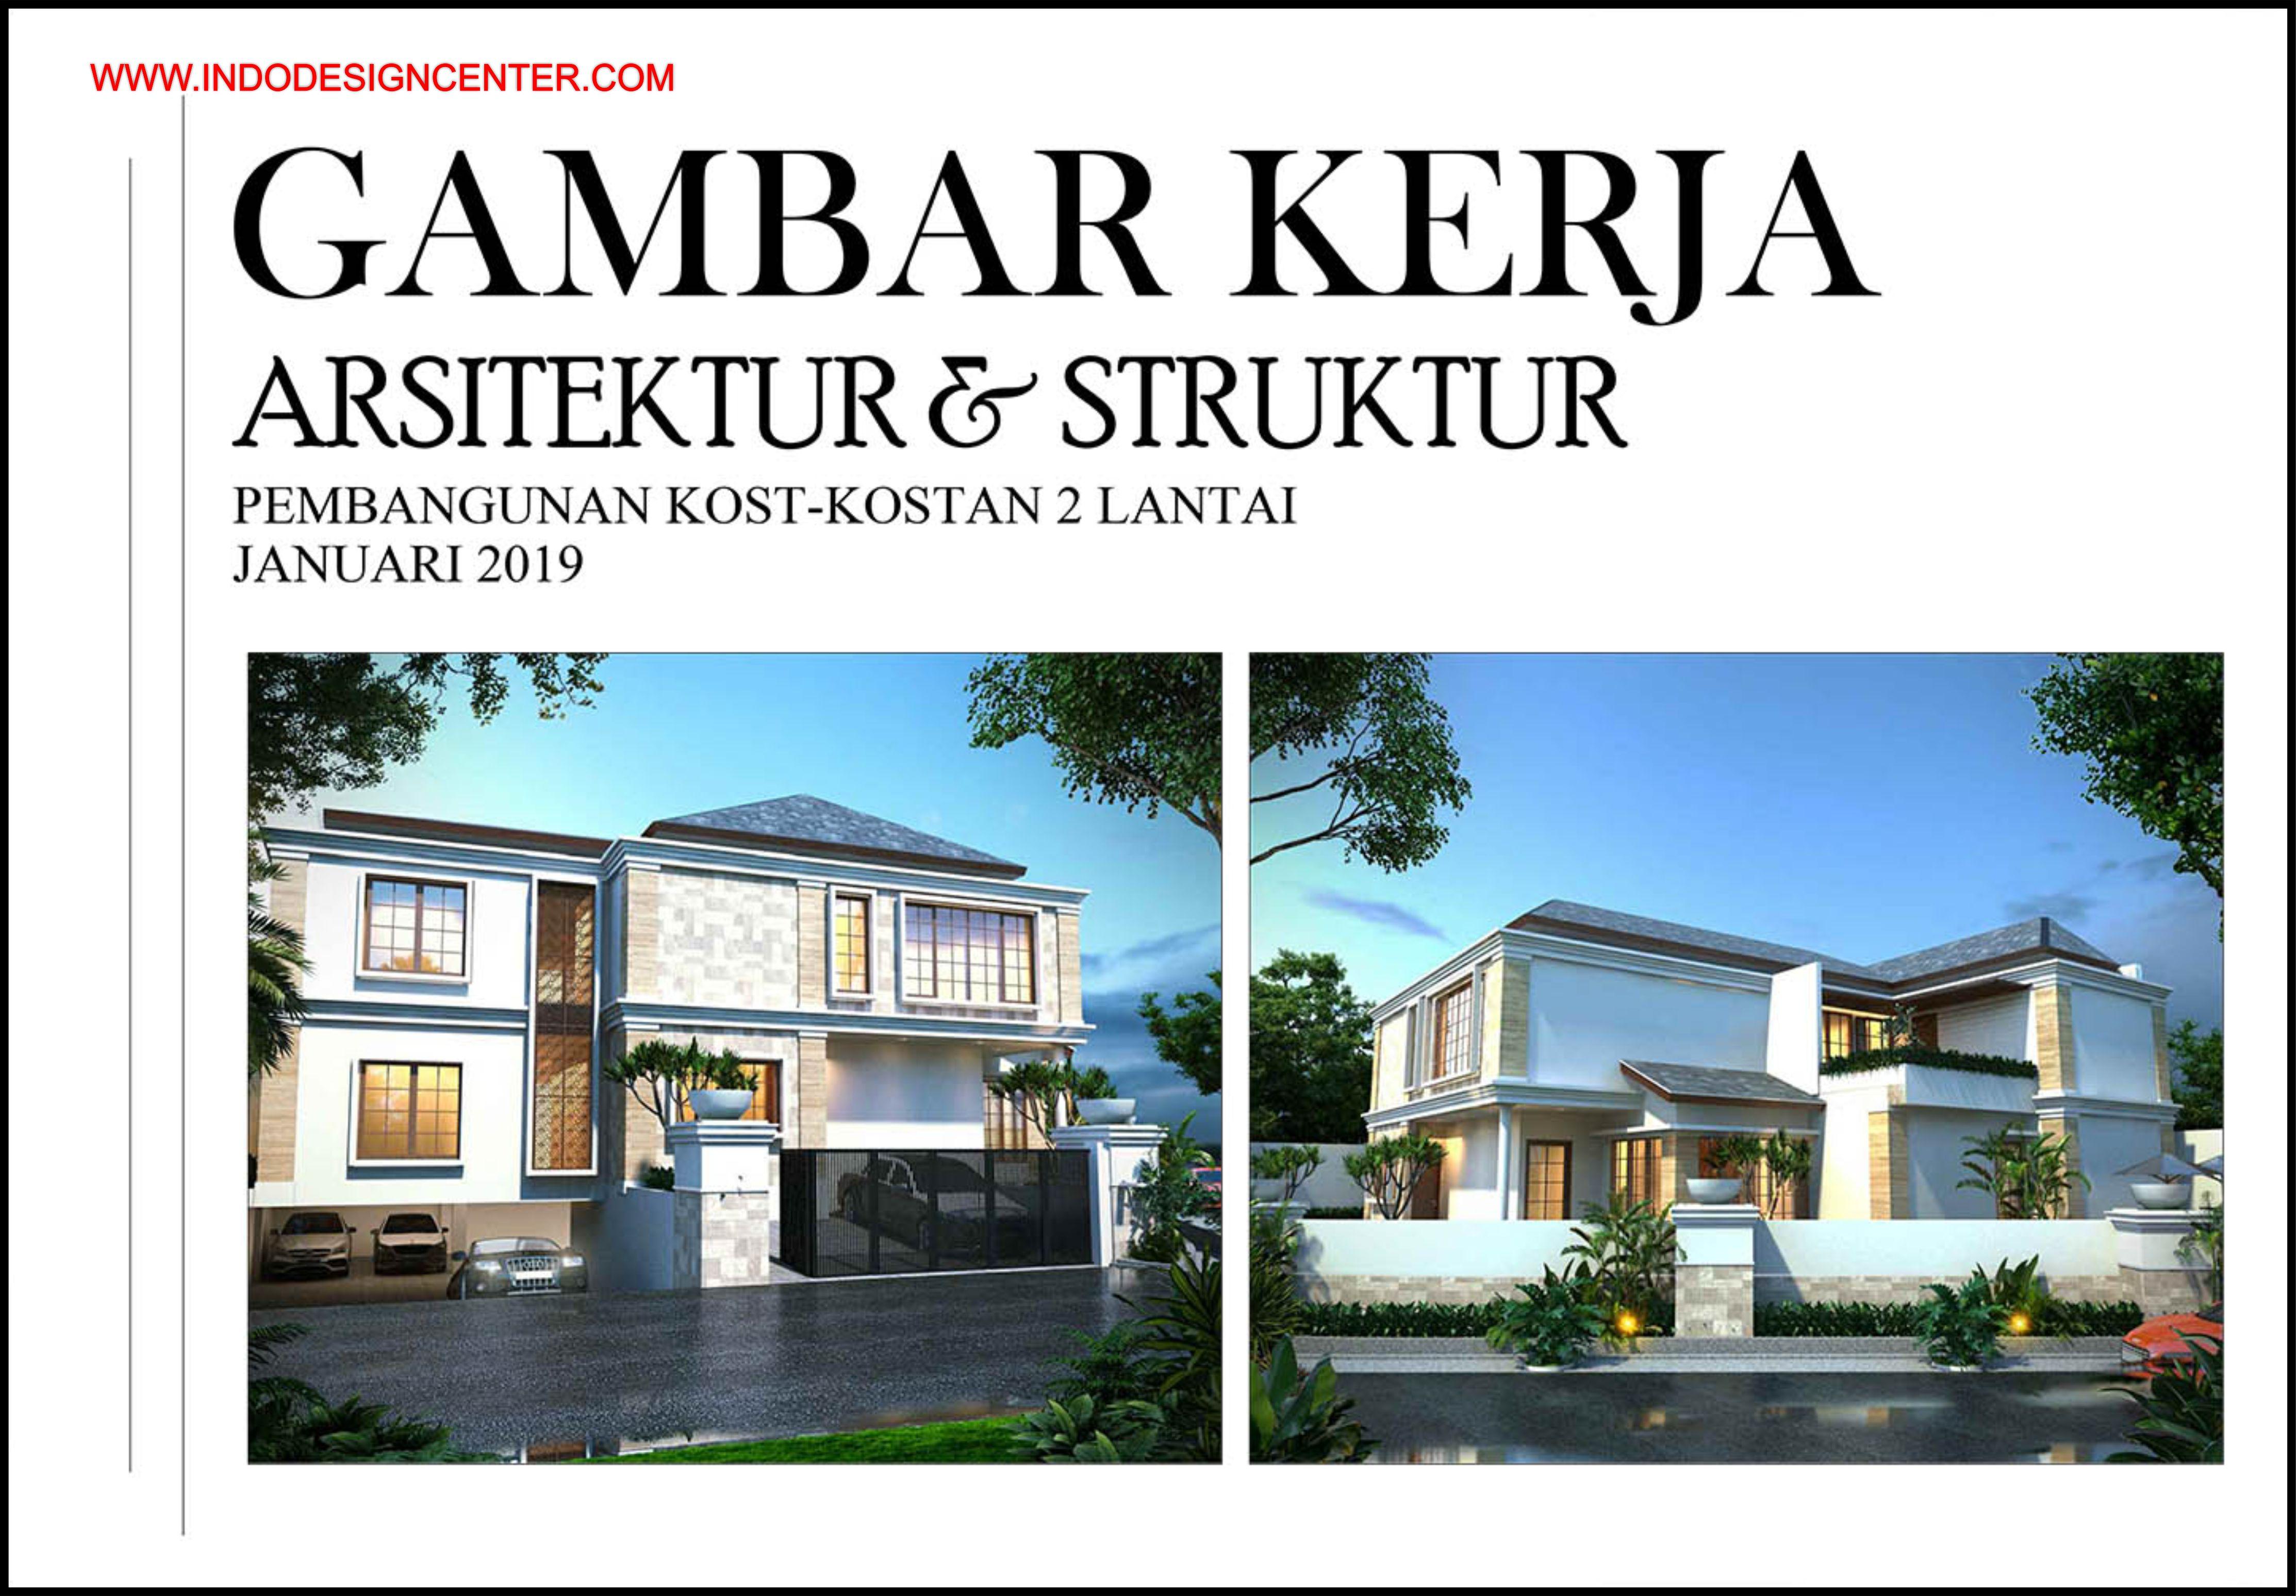 Gambar Kerja Rumah Kosan Autocad Dwg Minimalis 2 Lantai Pak Viat Yogyakarta